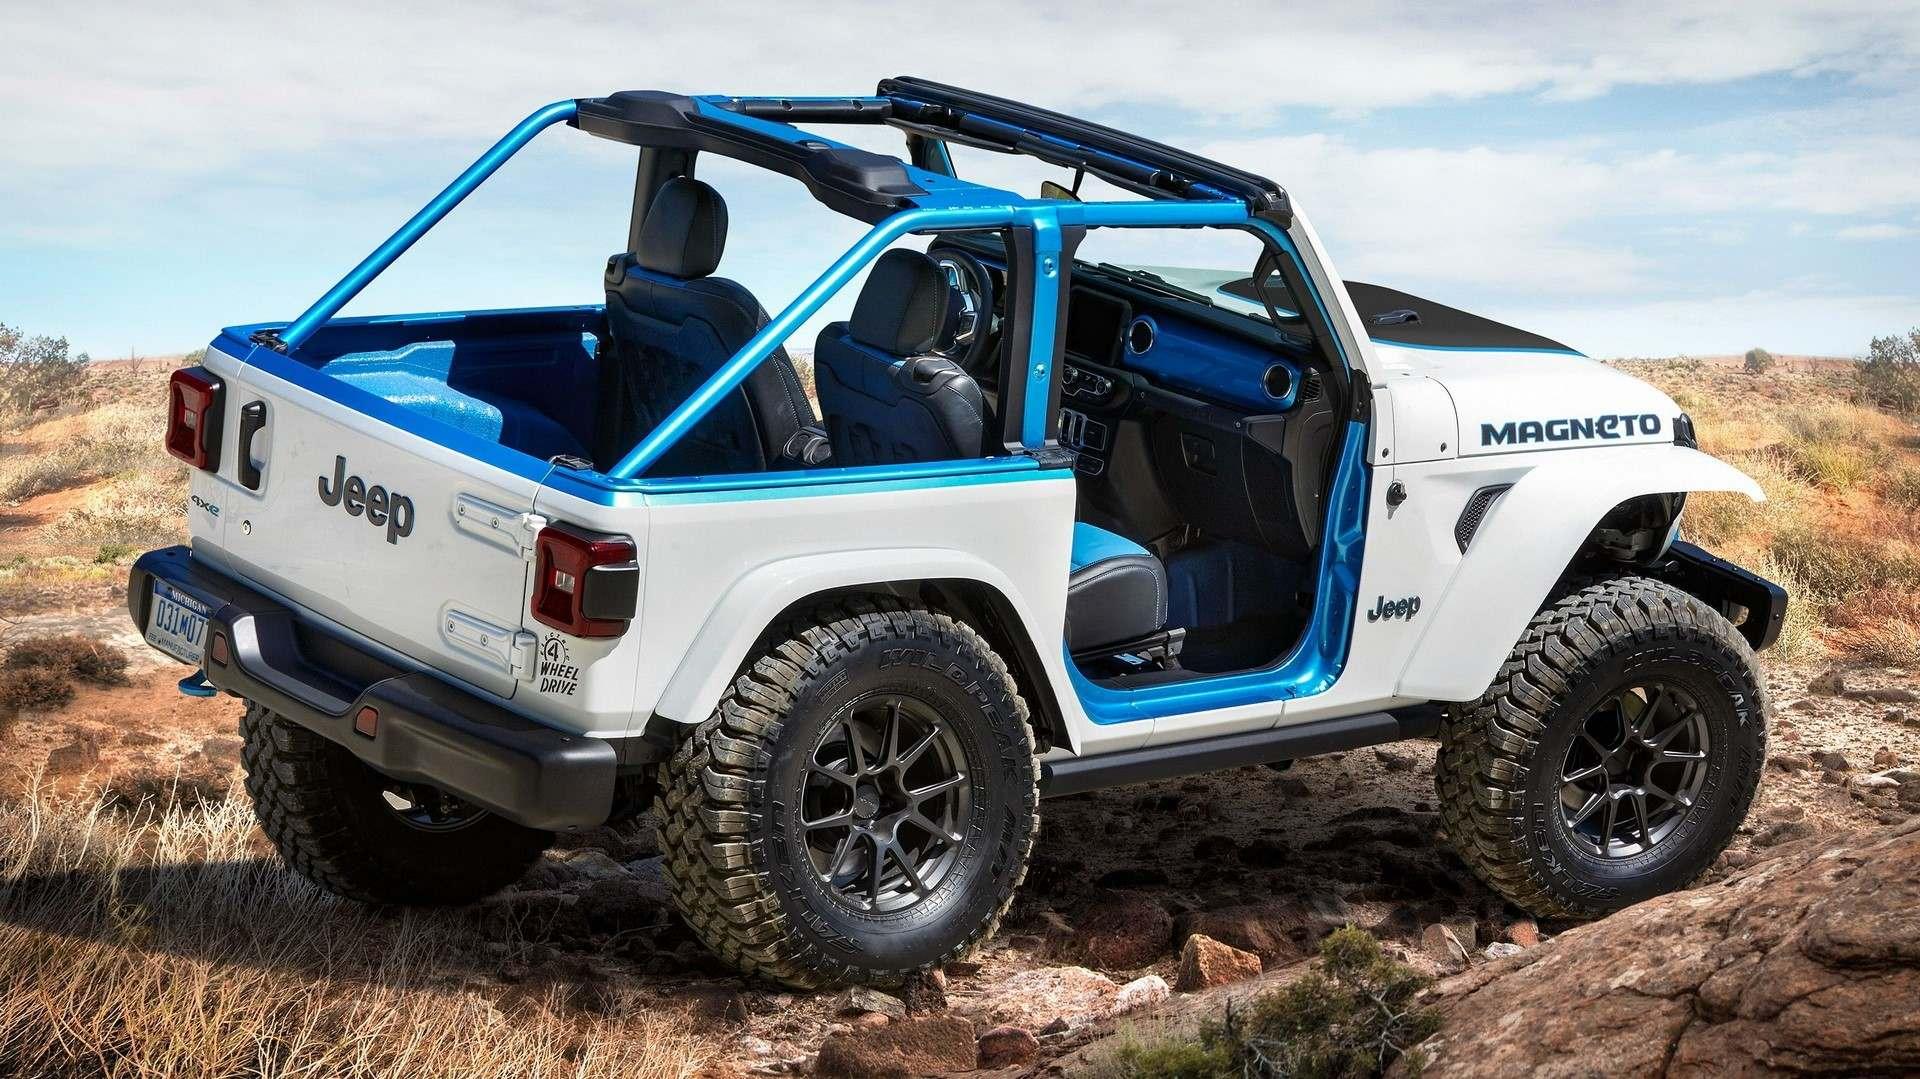 2021 Jeep Wrangler Magneto Concept (2)